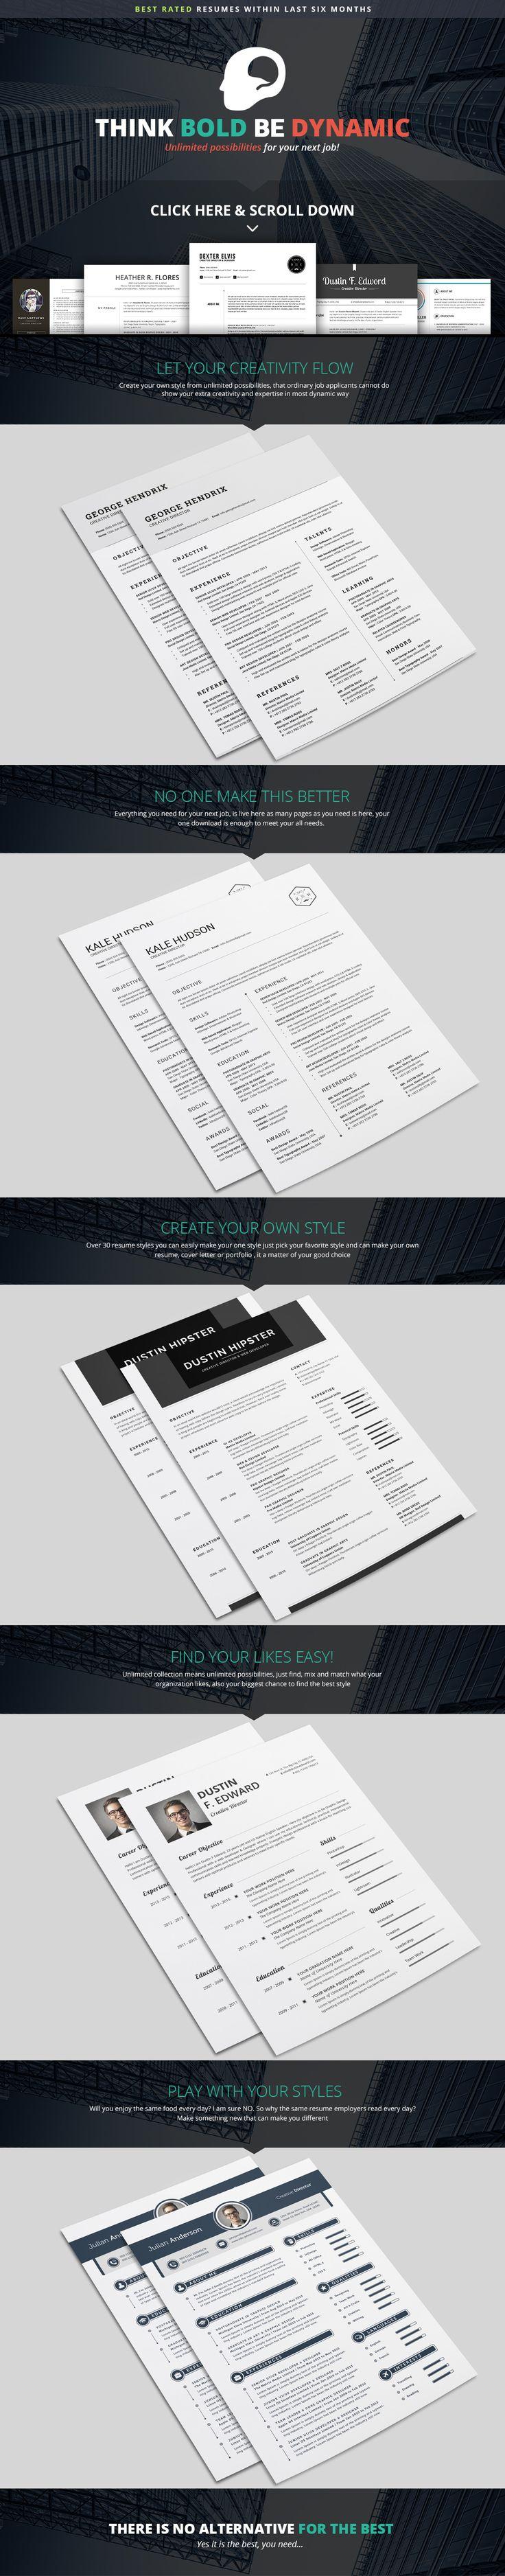 7 best Resumes images on Pinterest | Resume design, Resume templates ...